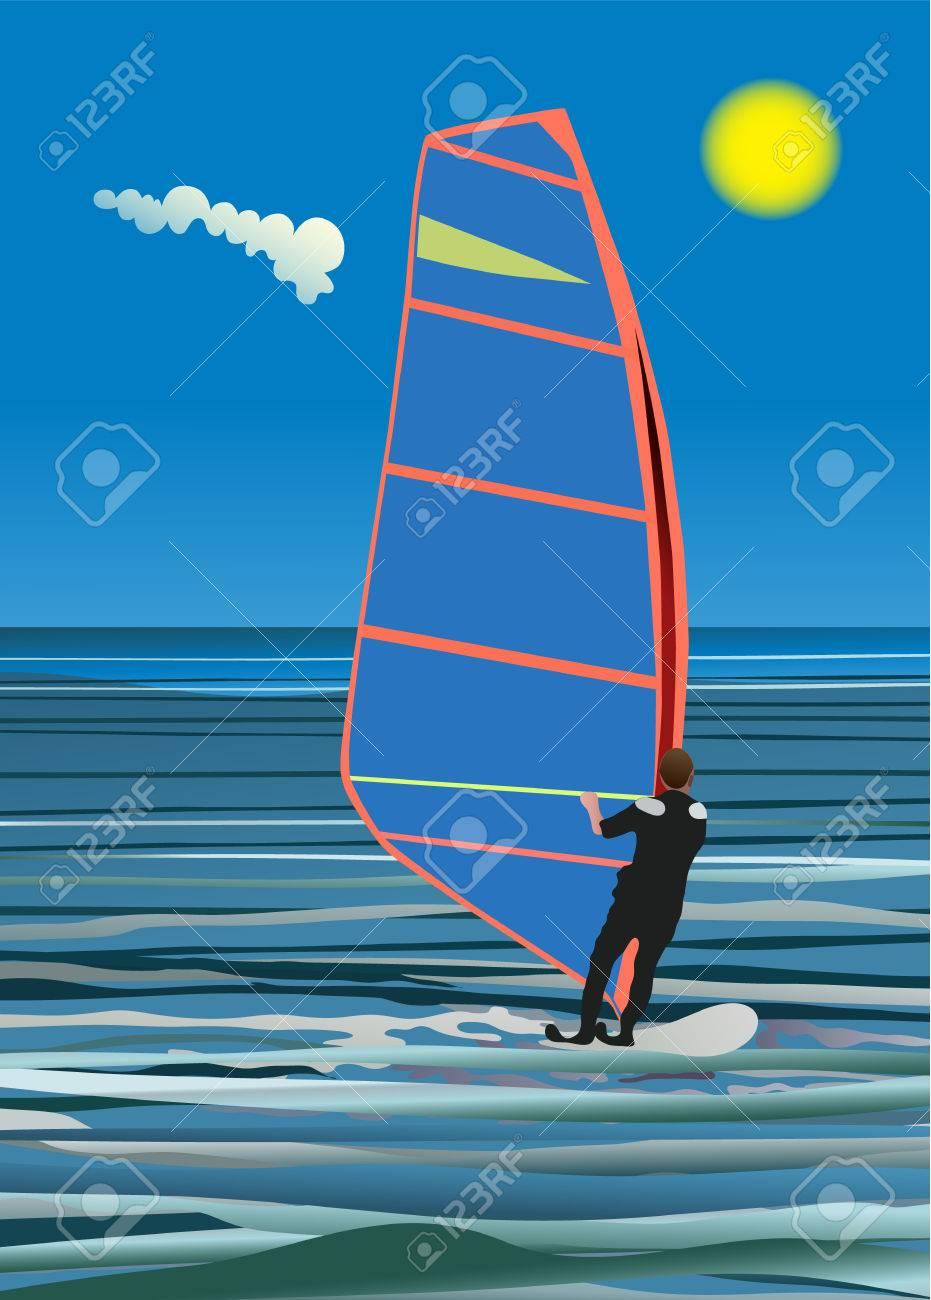 windsurfing Stock Vector - 2996444